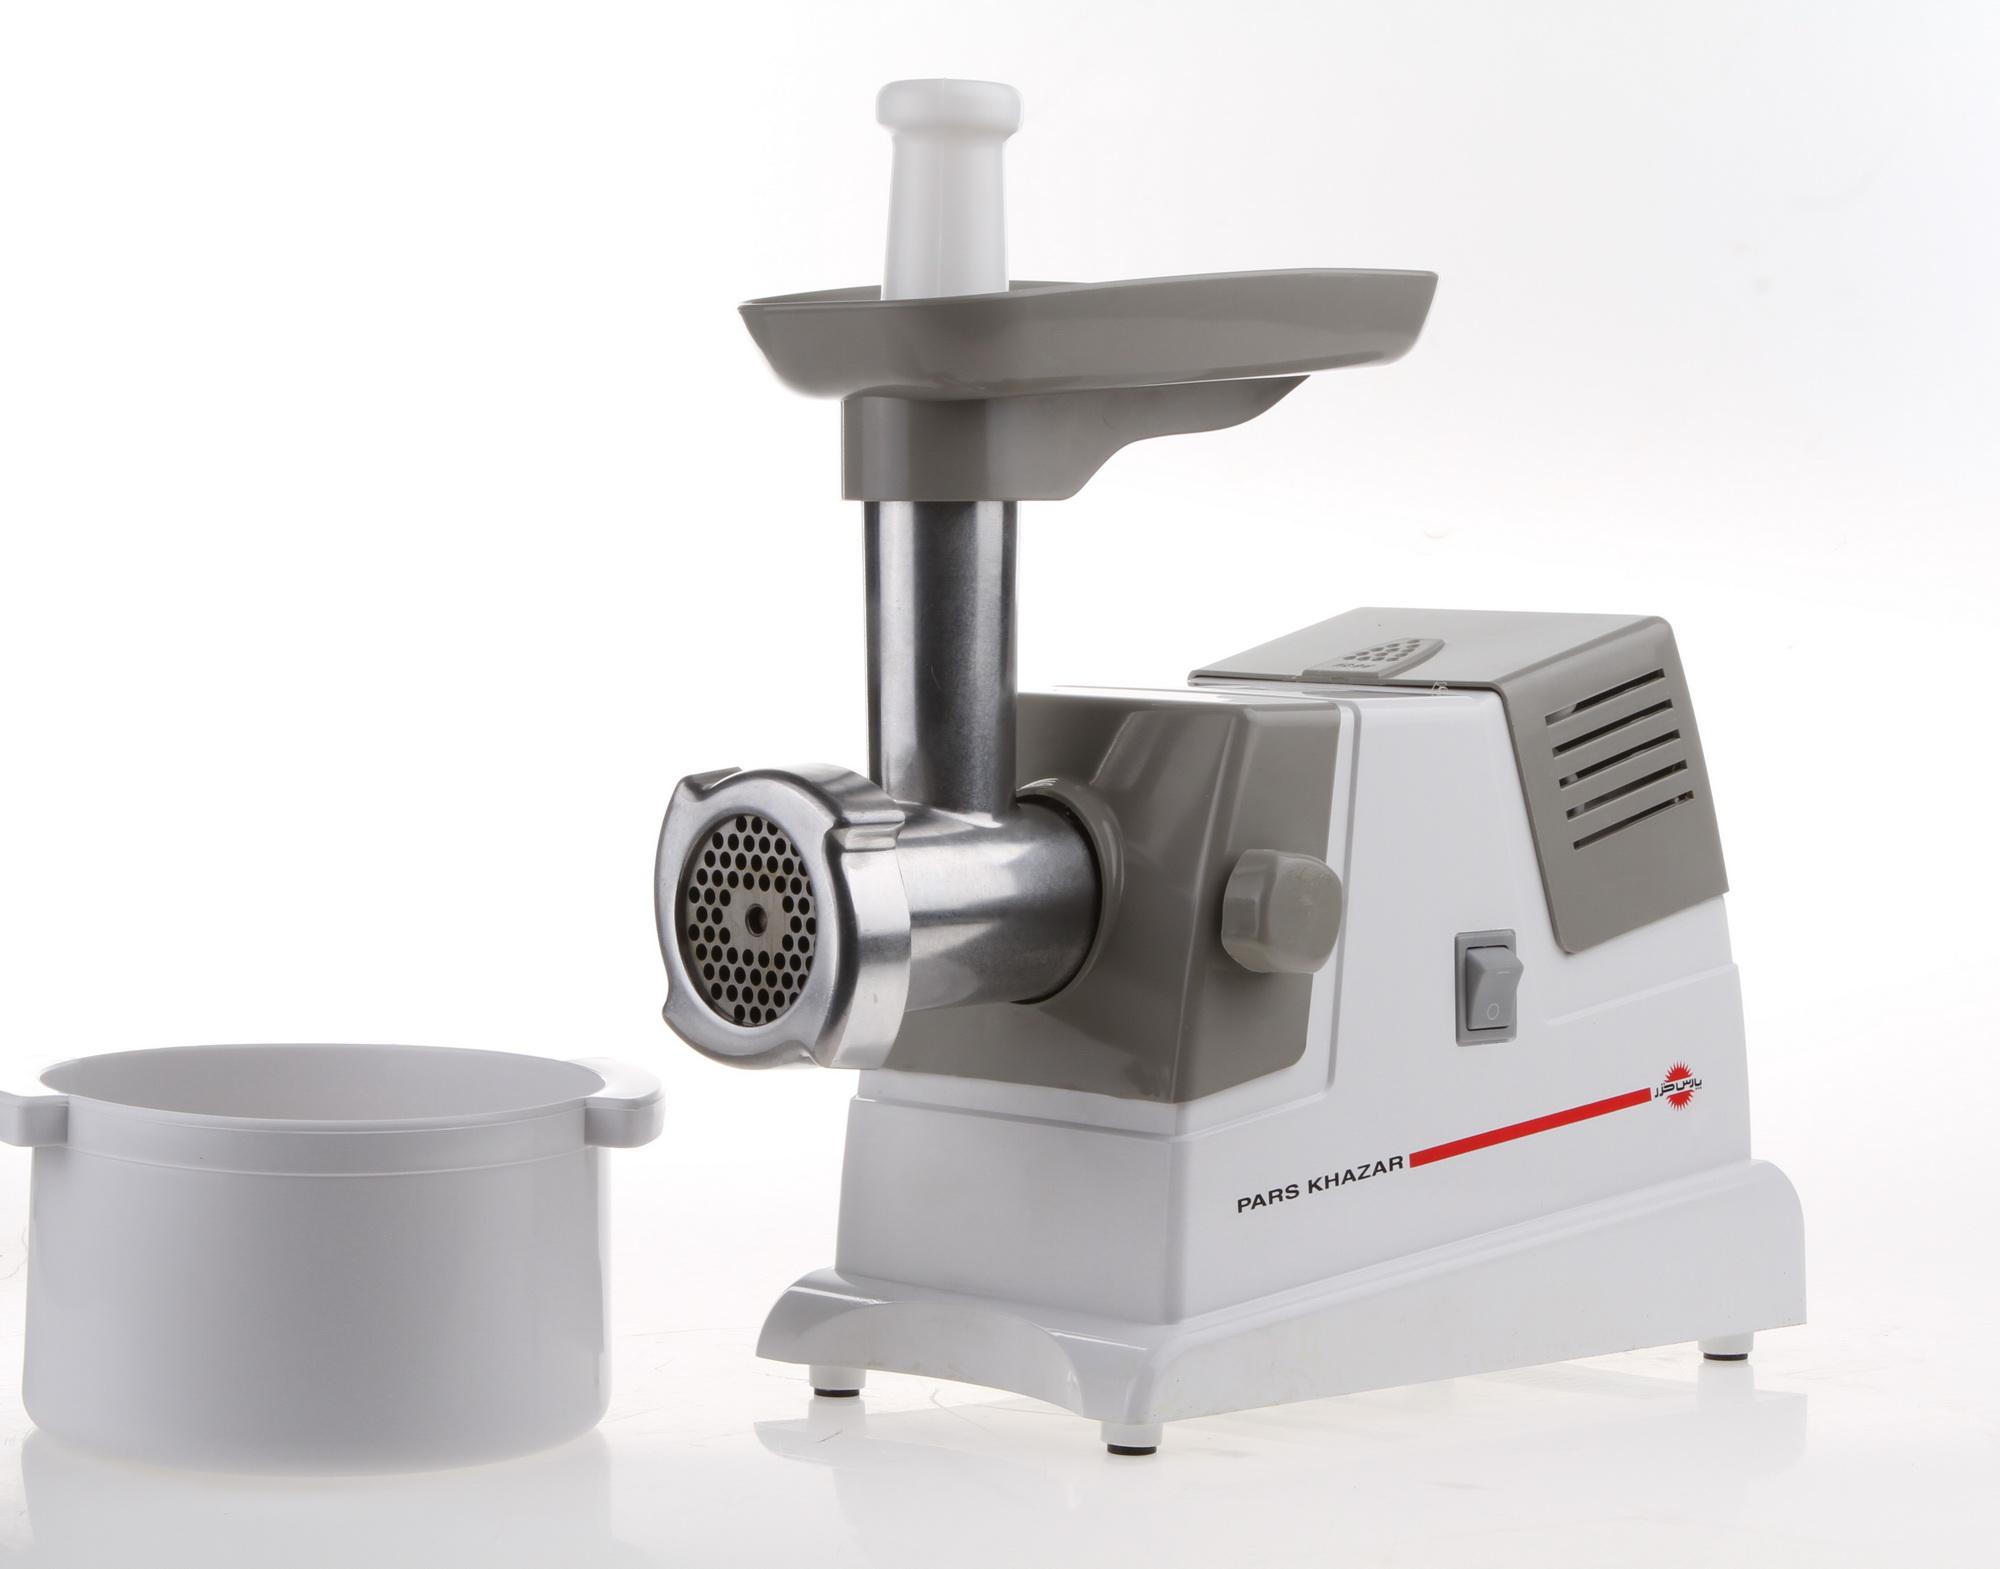 شبکه همراه بوش چرخ گوشت پارس خزر MG.1400-MG.1600